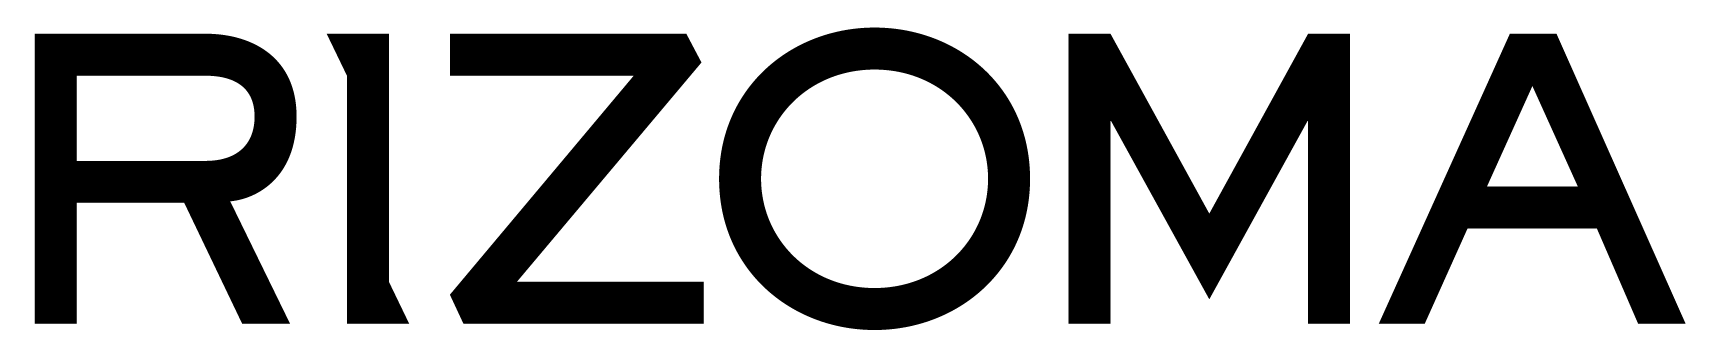 Rizoma-Logo-v2-01.png